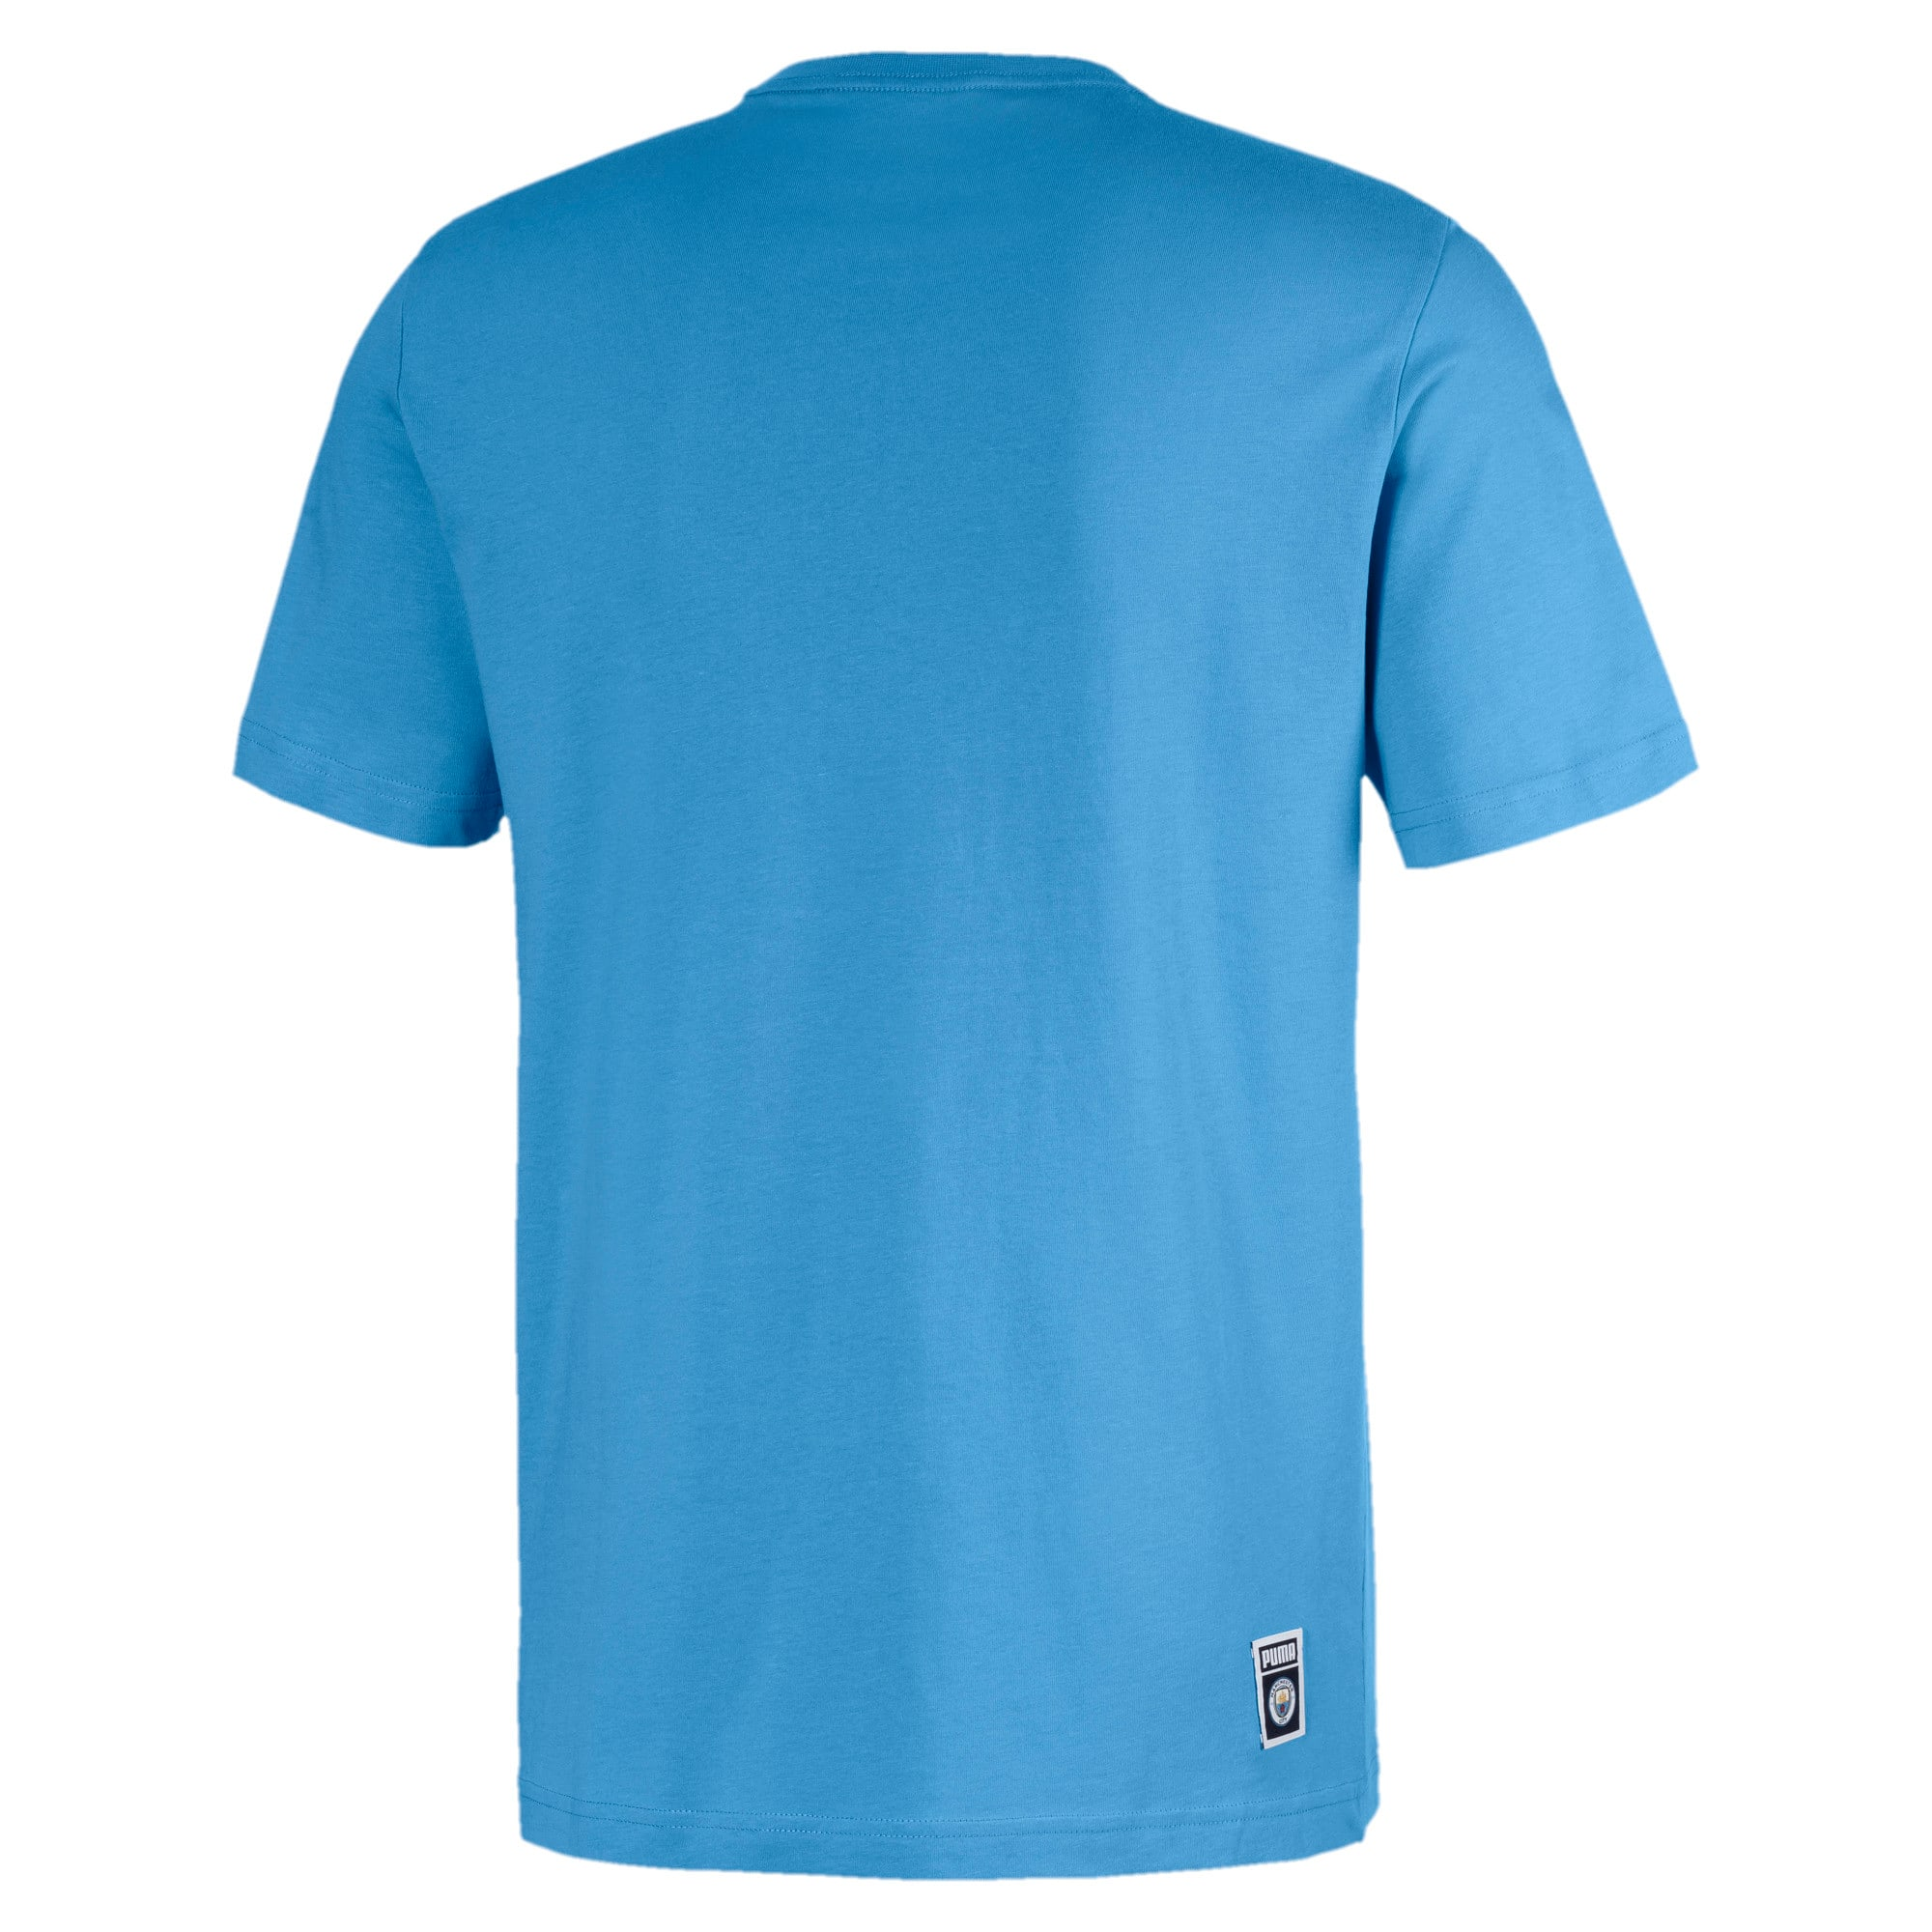 Thumbnail 2 of Manchester City Herren Shoe Tag T-Shirt, Team Light Blue-Puma white, medium